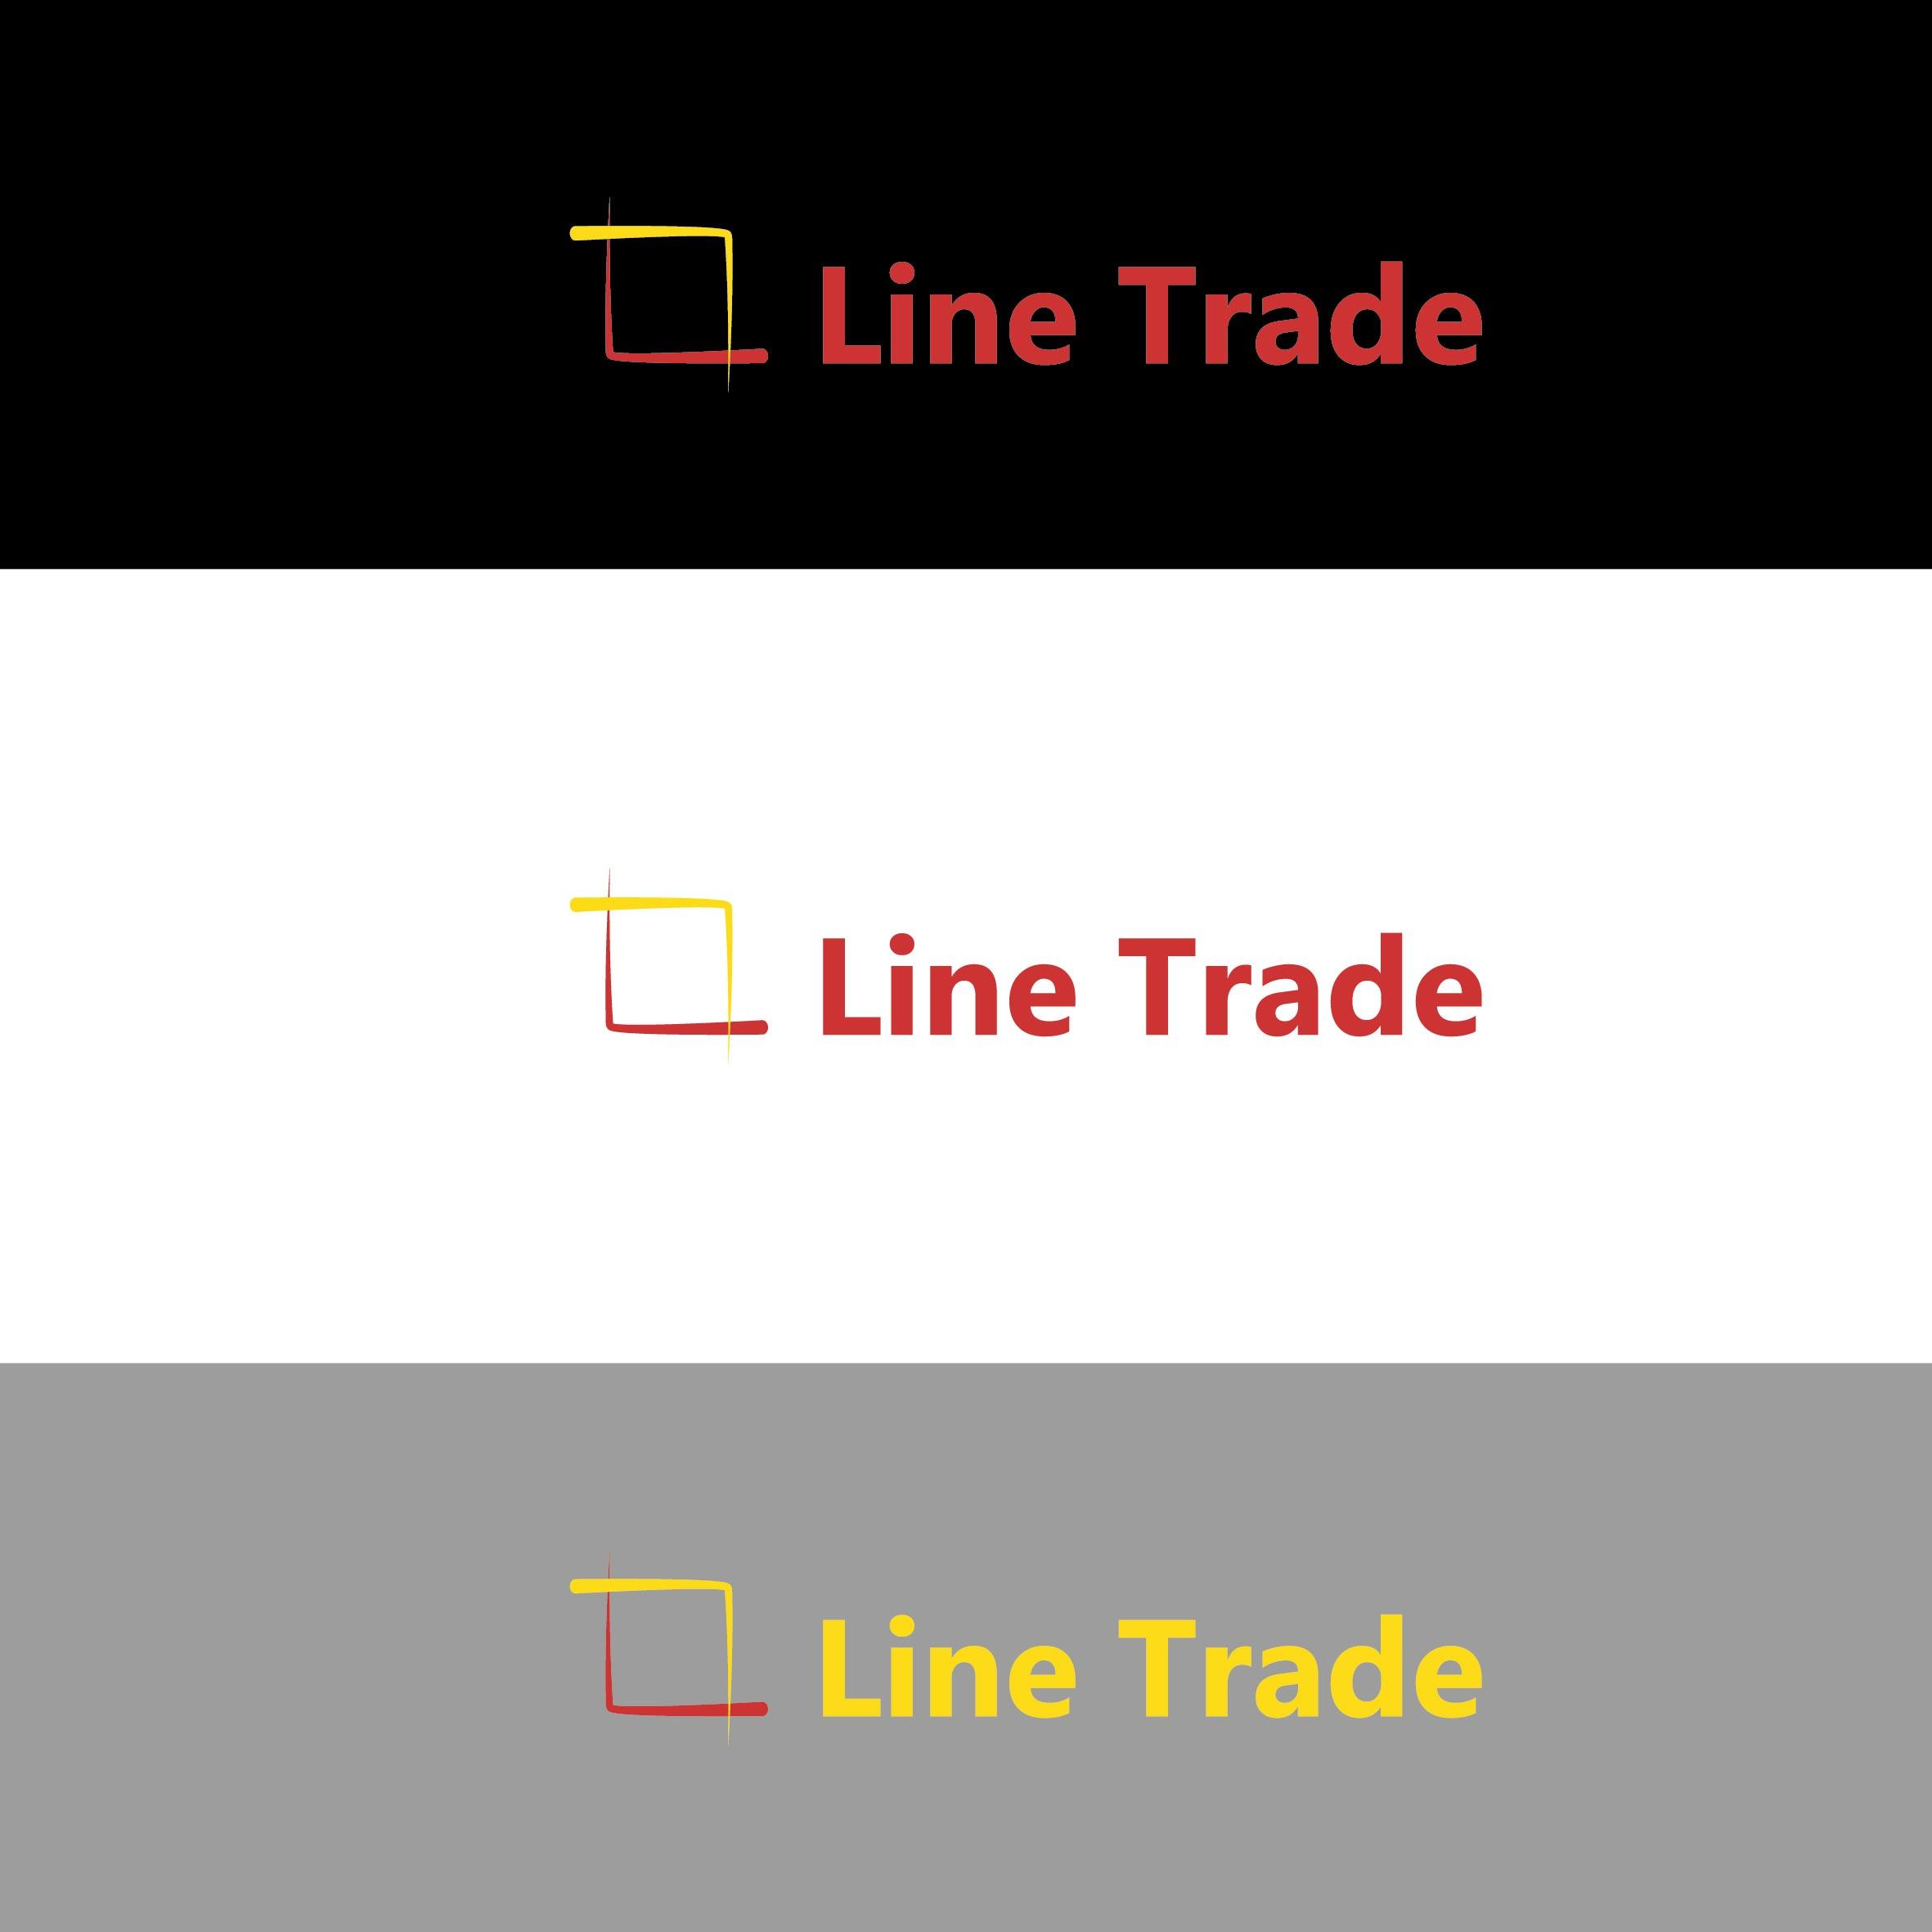 Разработка логотипа компании Line Trade фото f_75450f7ecda07522.jpg